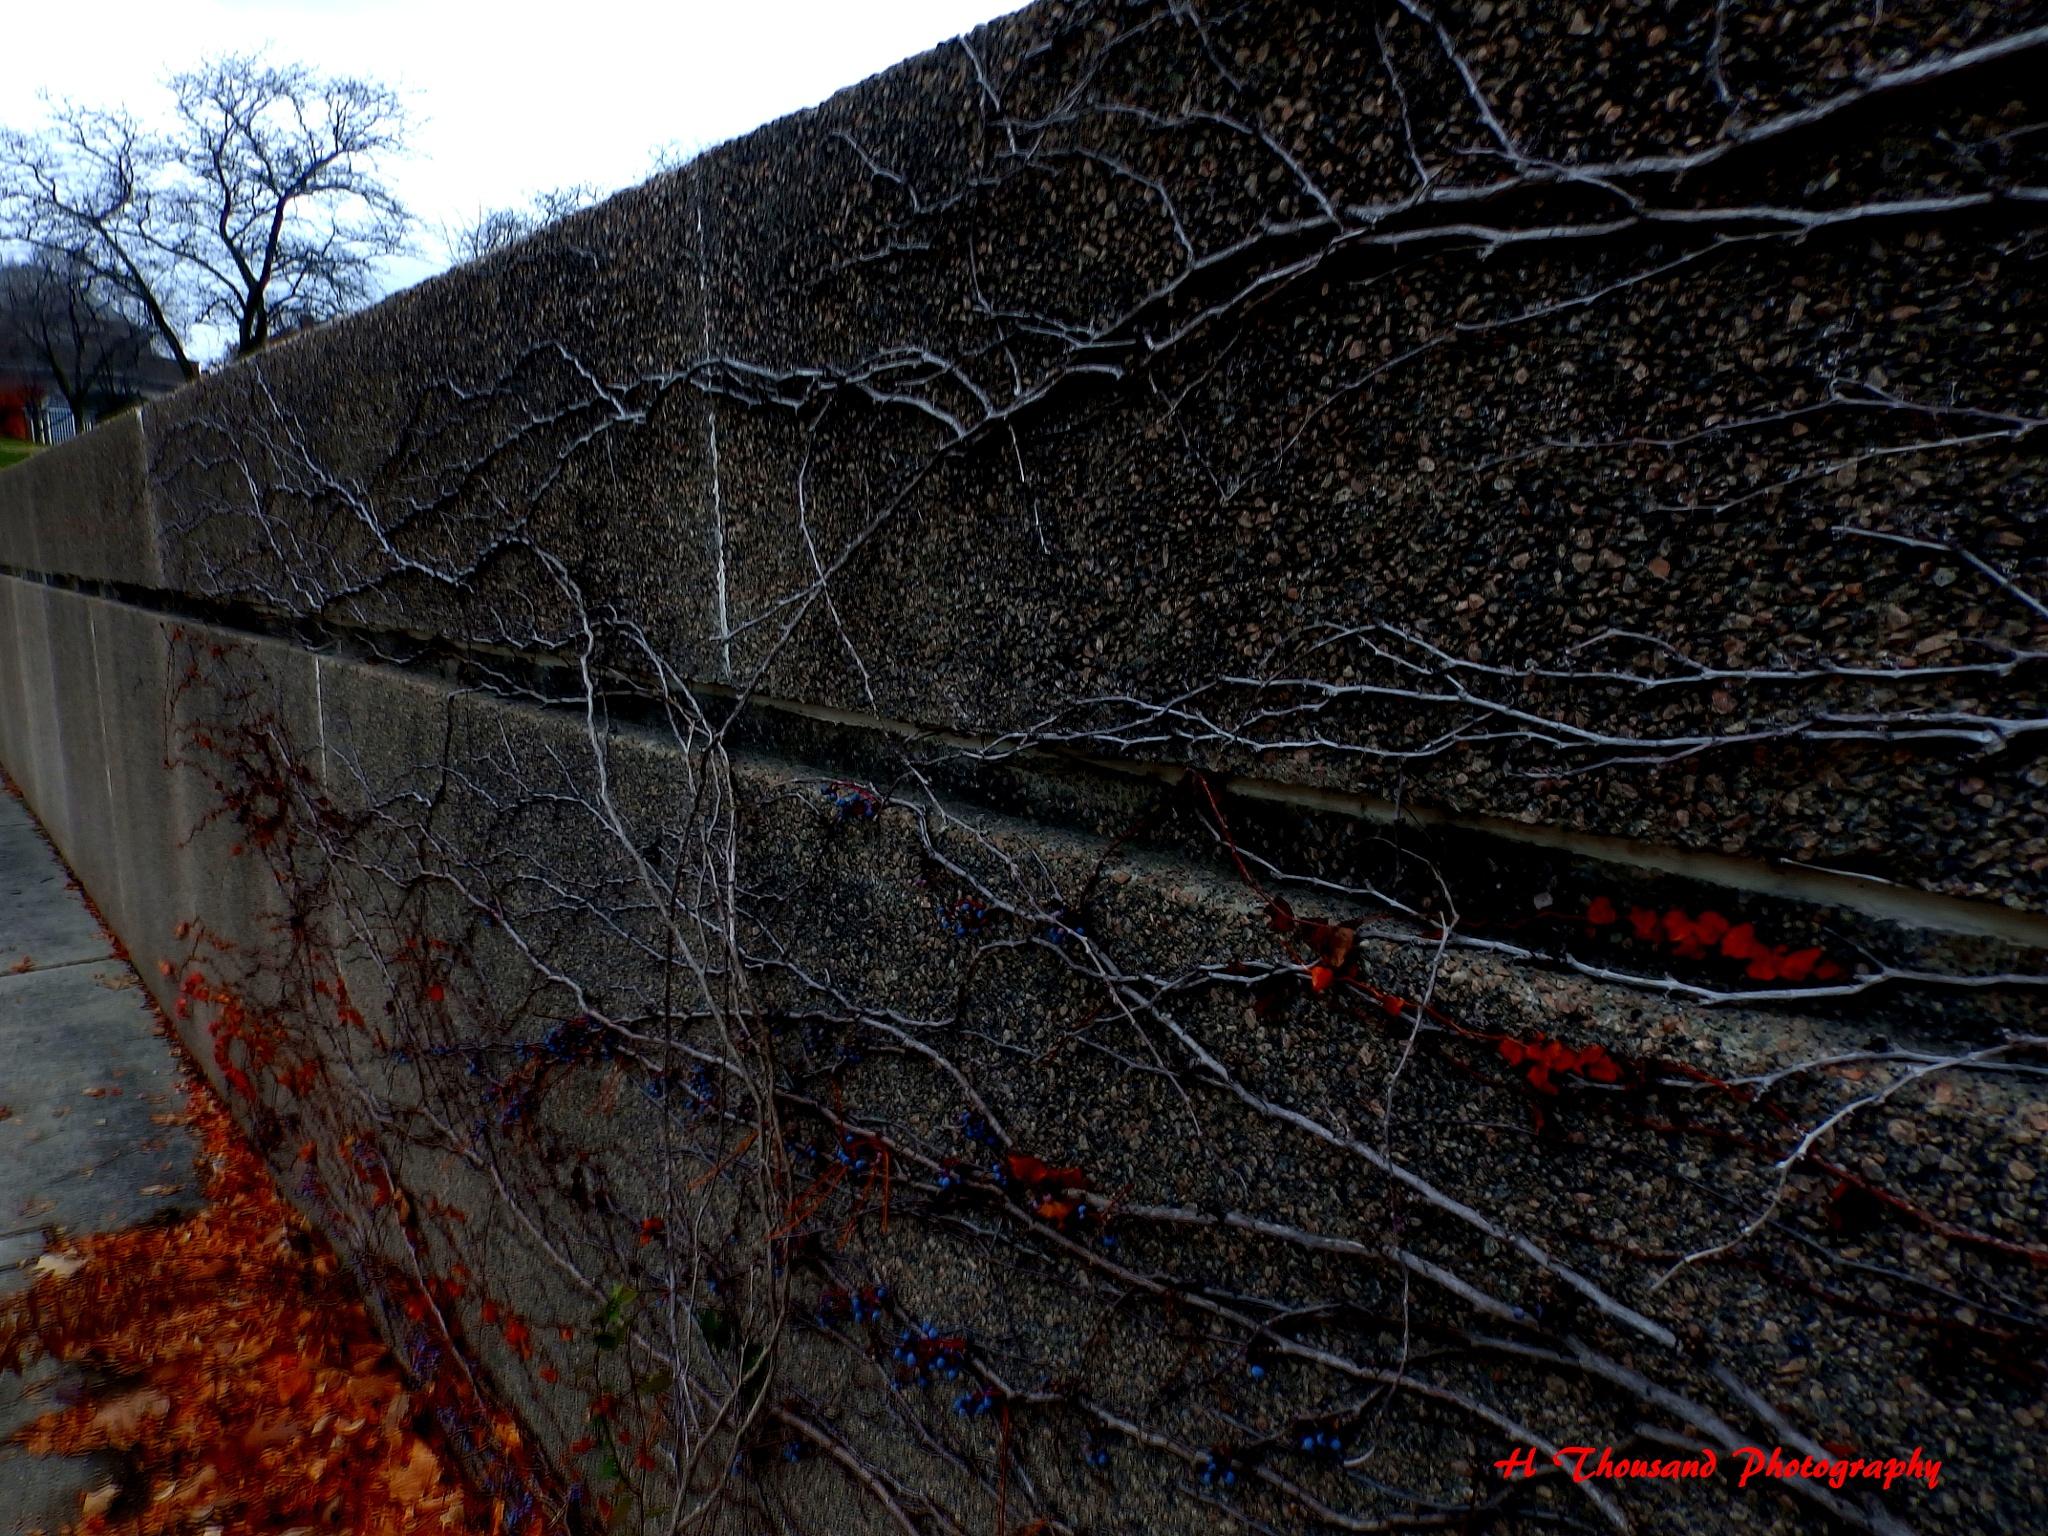 Creeping vine. by hrthousandjr